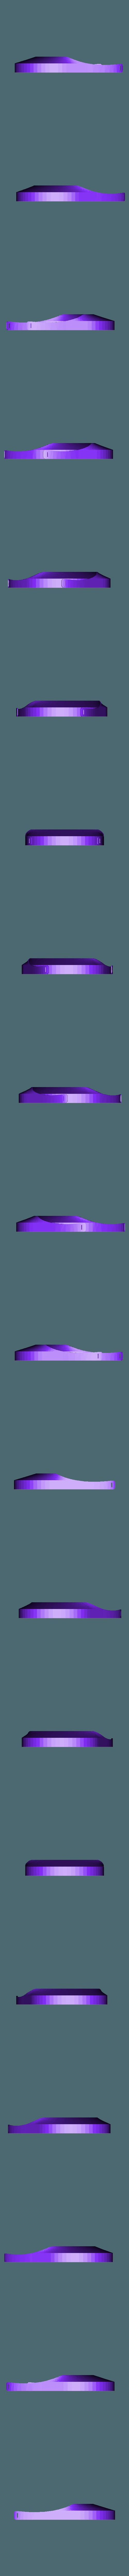 mascara tiguer woods sin soporte.STL Download free STL file ECONOMIC MASK COVID19 with visor without brackets leaves 18 x kg • 3D print design, Titosoft